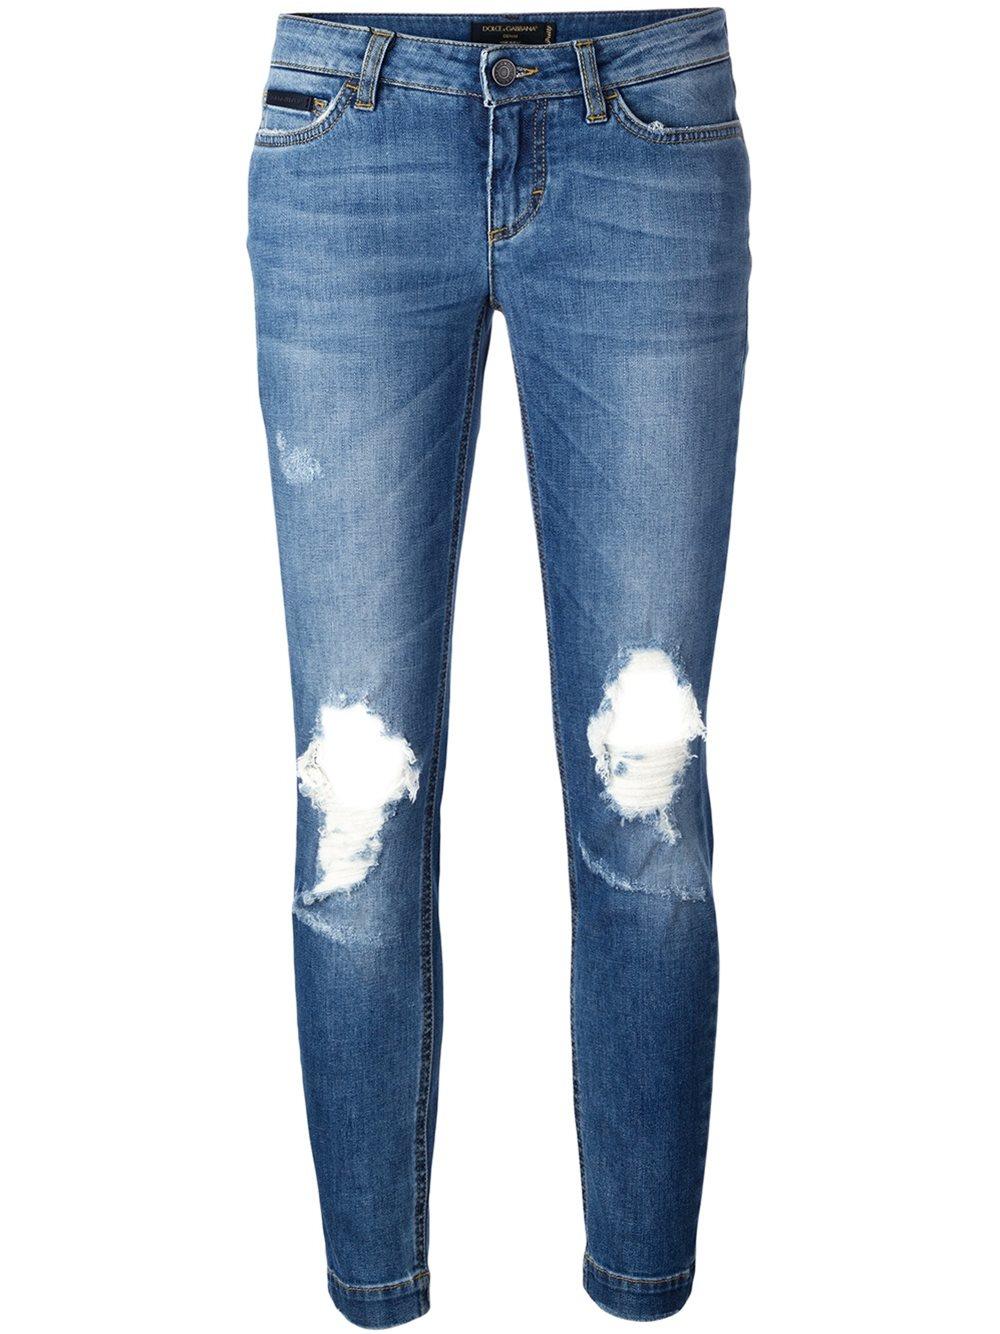 dolce gabbana 39 pretty 39 jeans in blue lyst. Black Bedroom Furniture Sets. Home Design Ideas